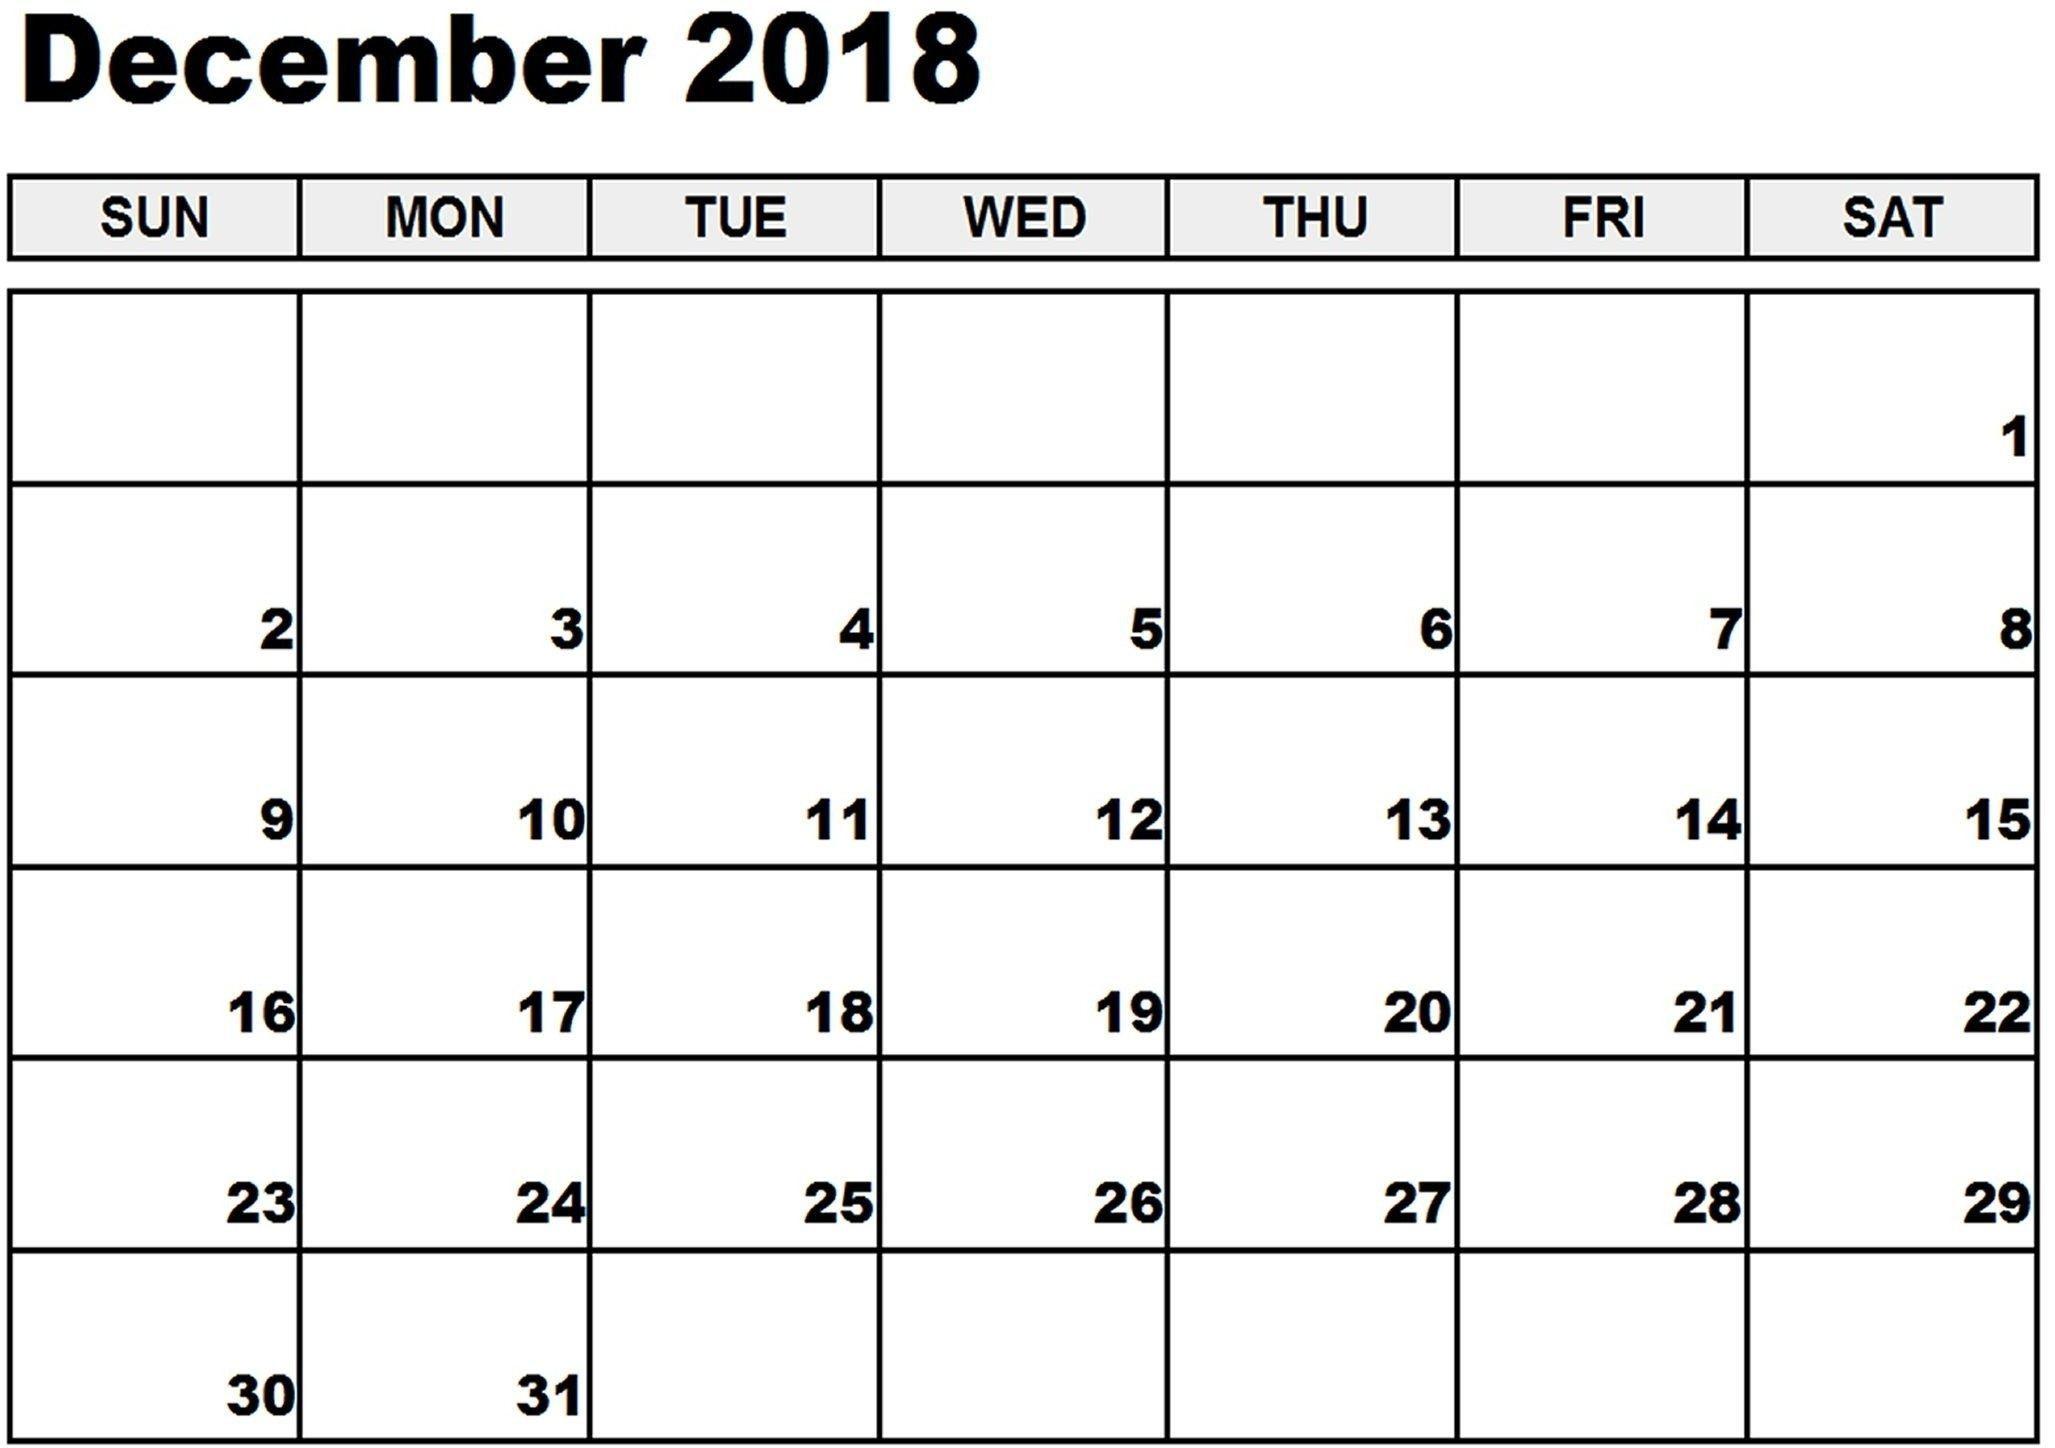 December 2018 Calendar Canada #canadacalendar